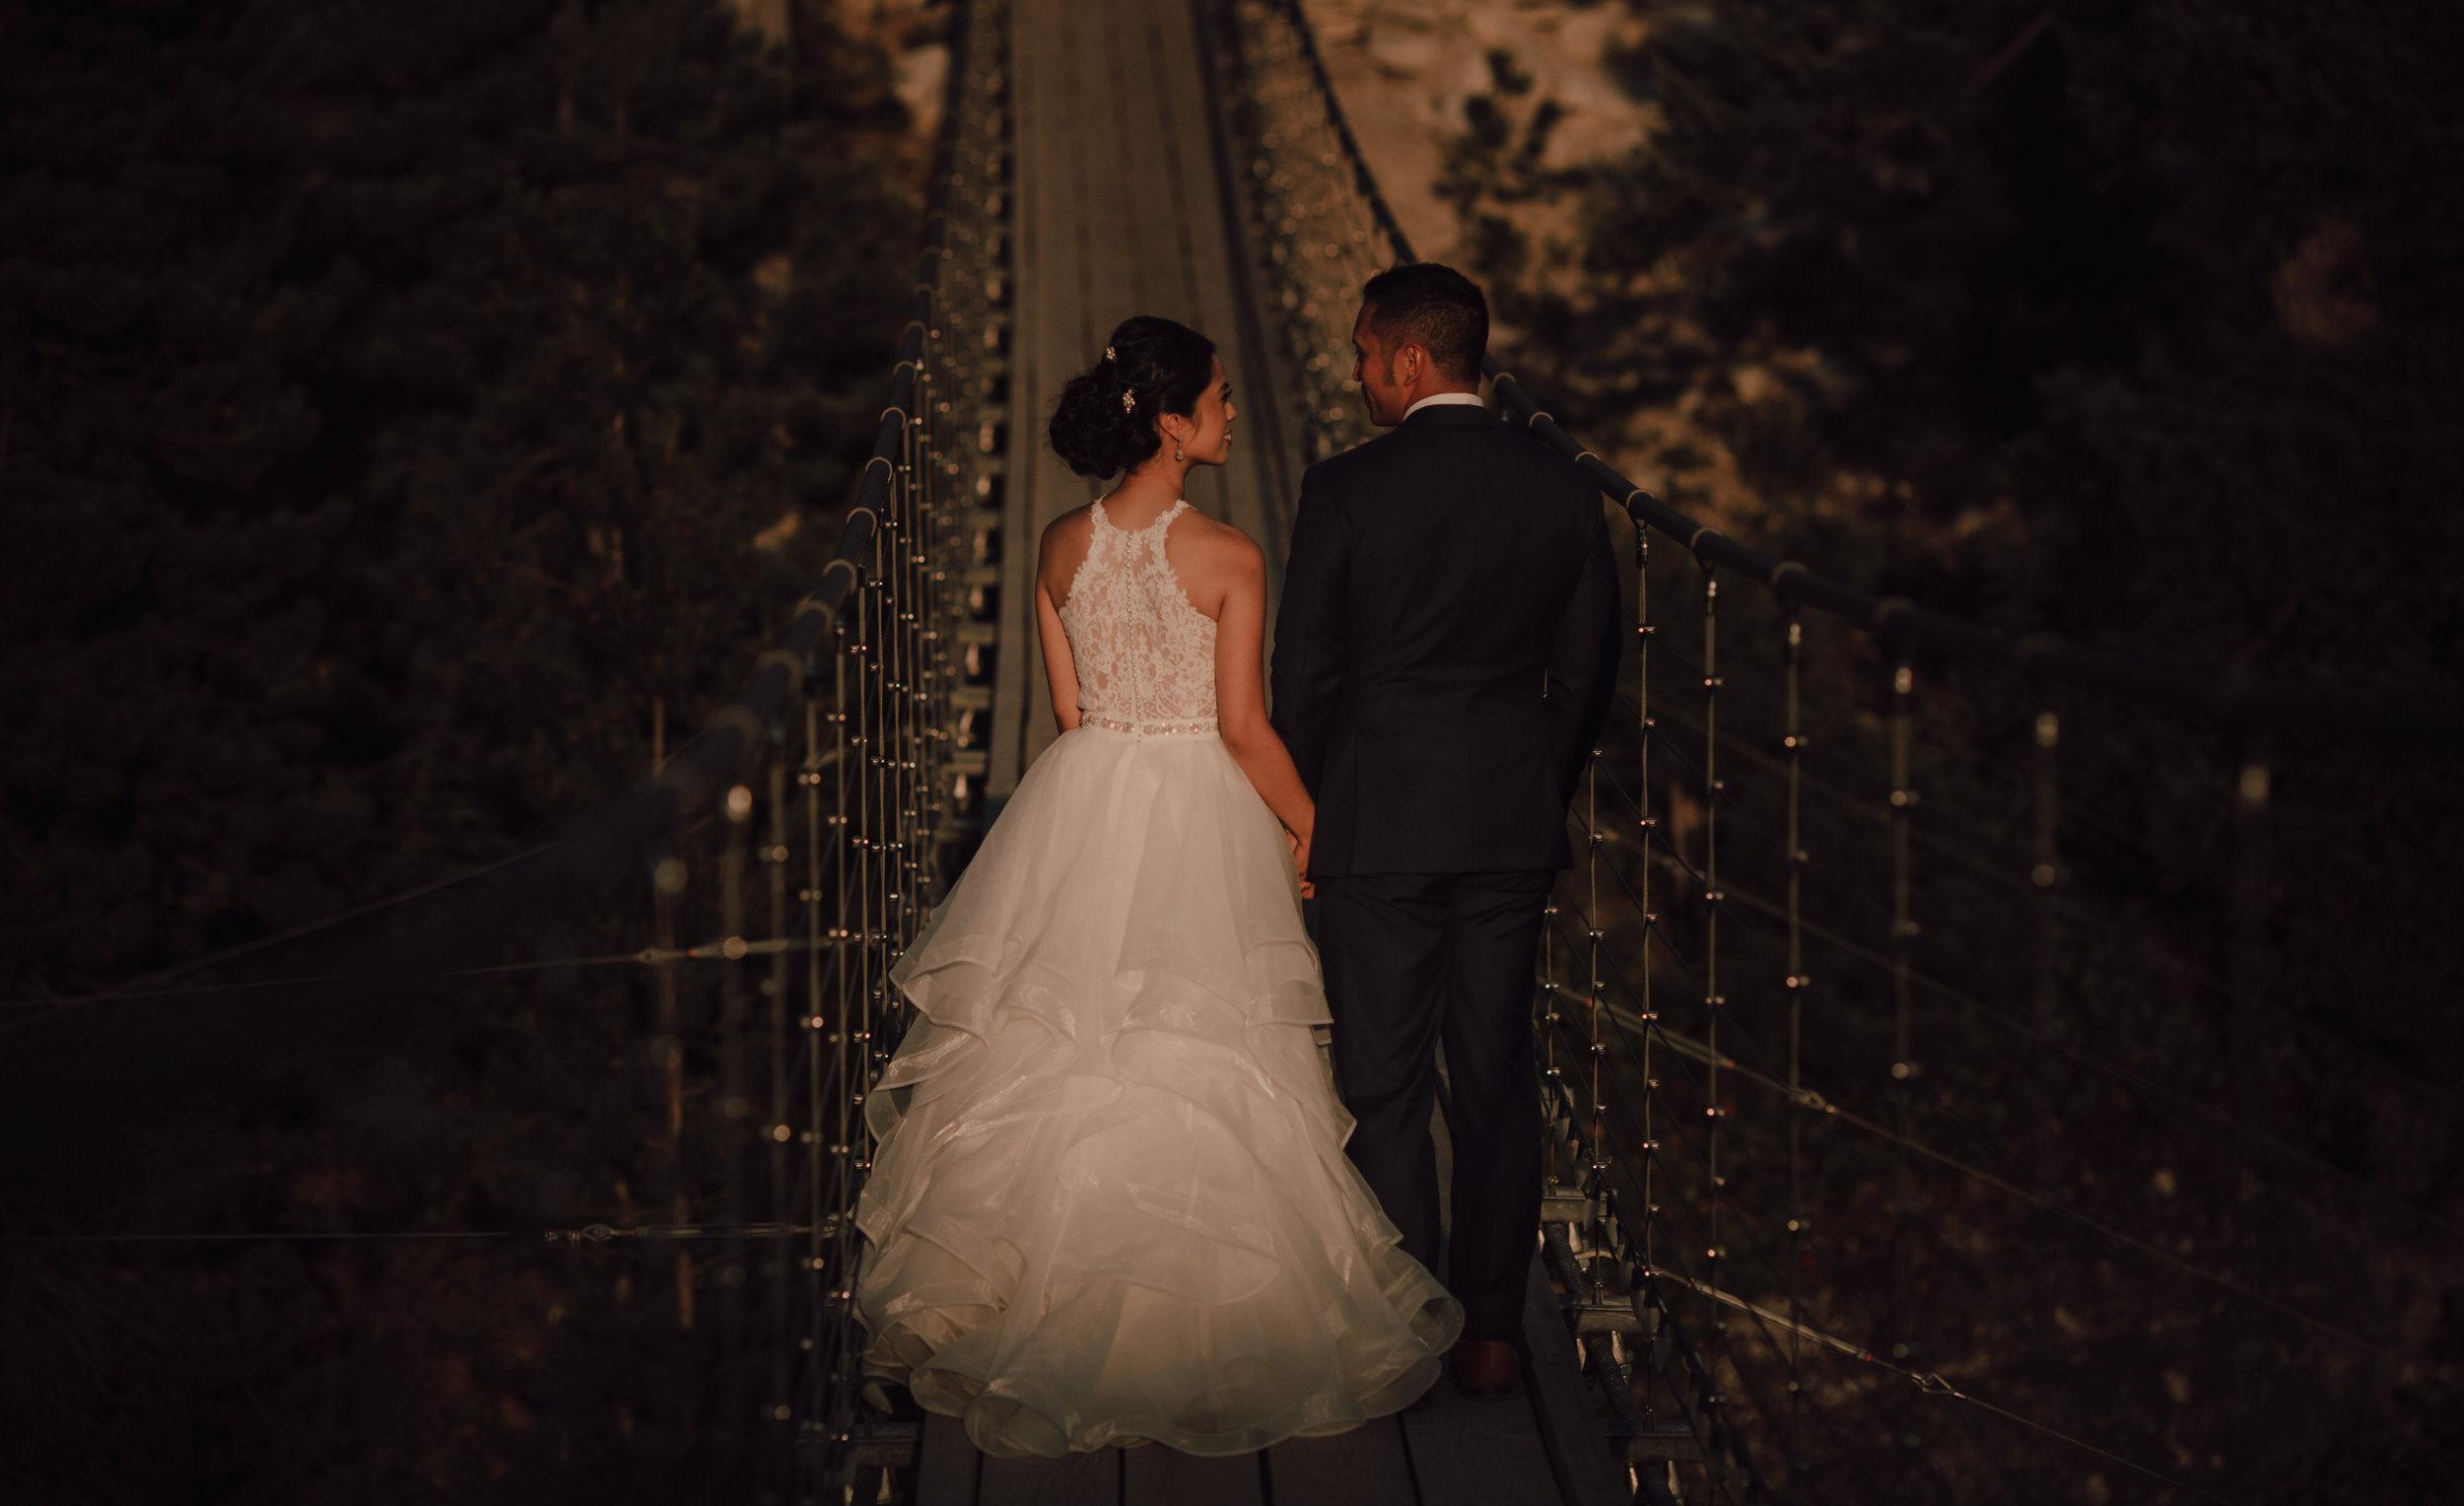 Squamish Wedding Photographer - Sea to Sky Gondola Wedding Photos -  Vancouver Wedding Photographer & Videographer - Sunshine Coast Wedding Photos - Sunshine Coast Wedding Photographer - Jennifer Picard Photography - IMG_0635.jpg